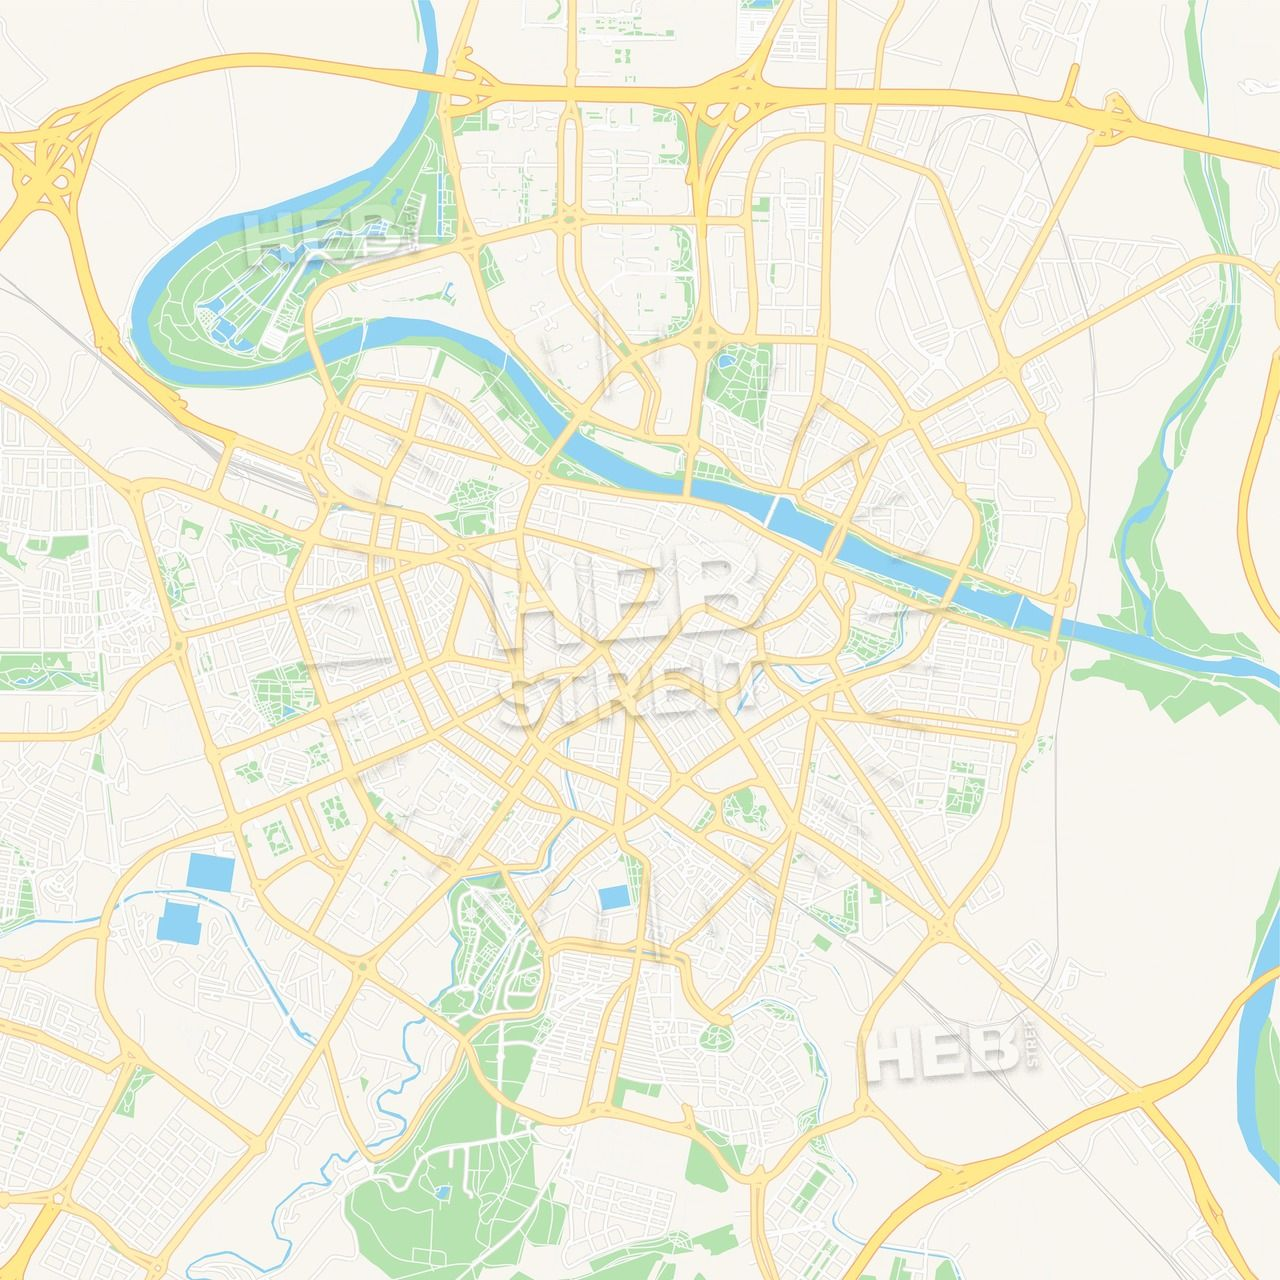 Zaragoza, Spain Vector Map - Clic Colors | Maps Vector Downloads on